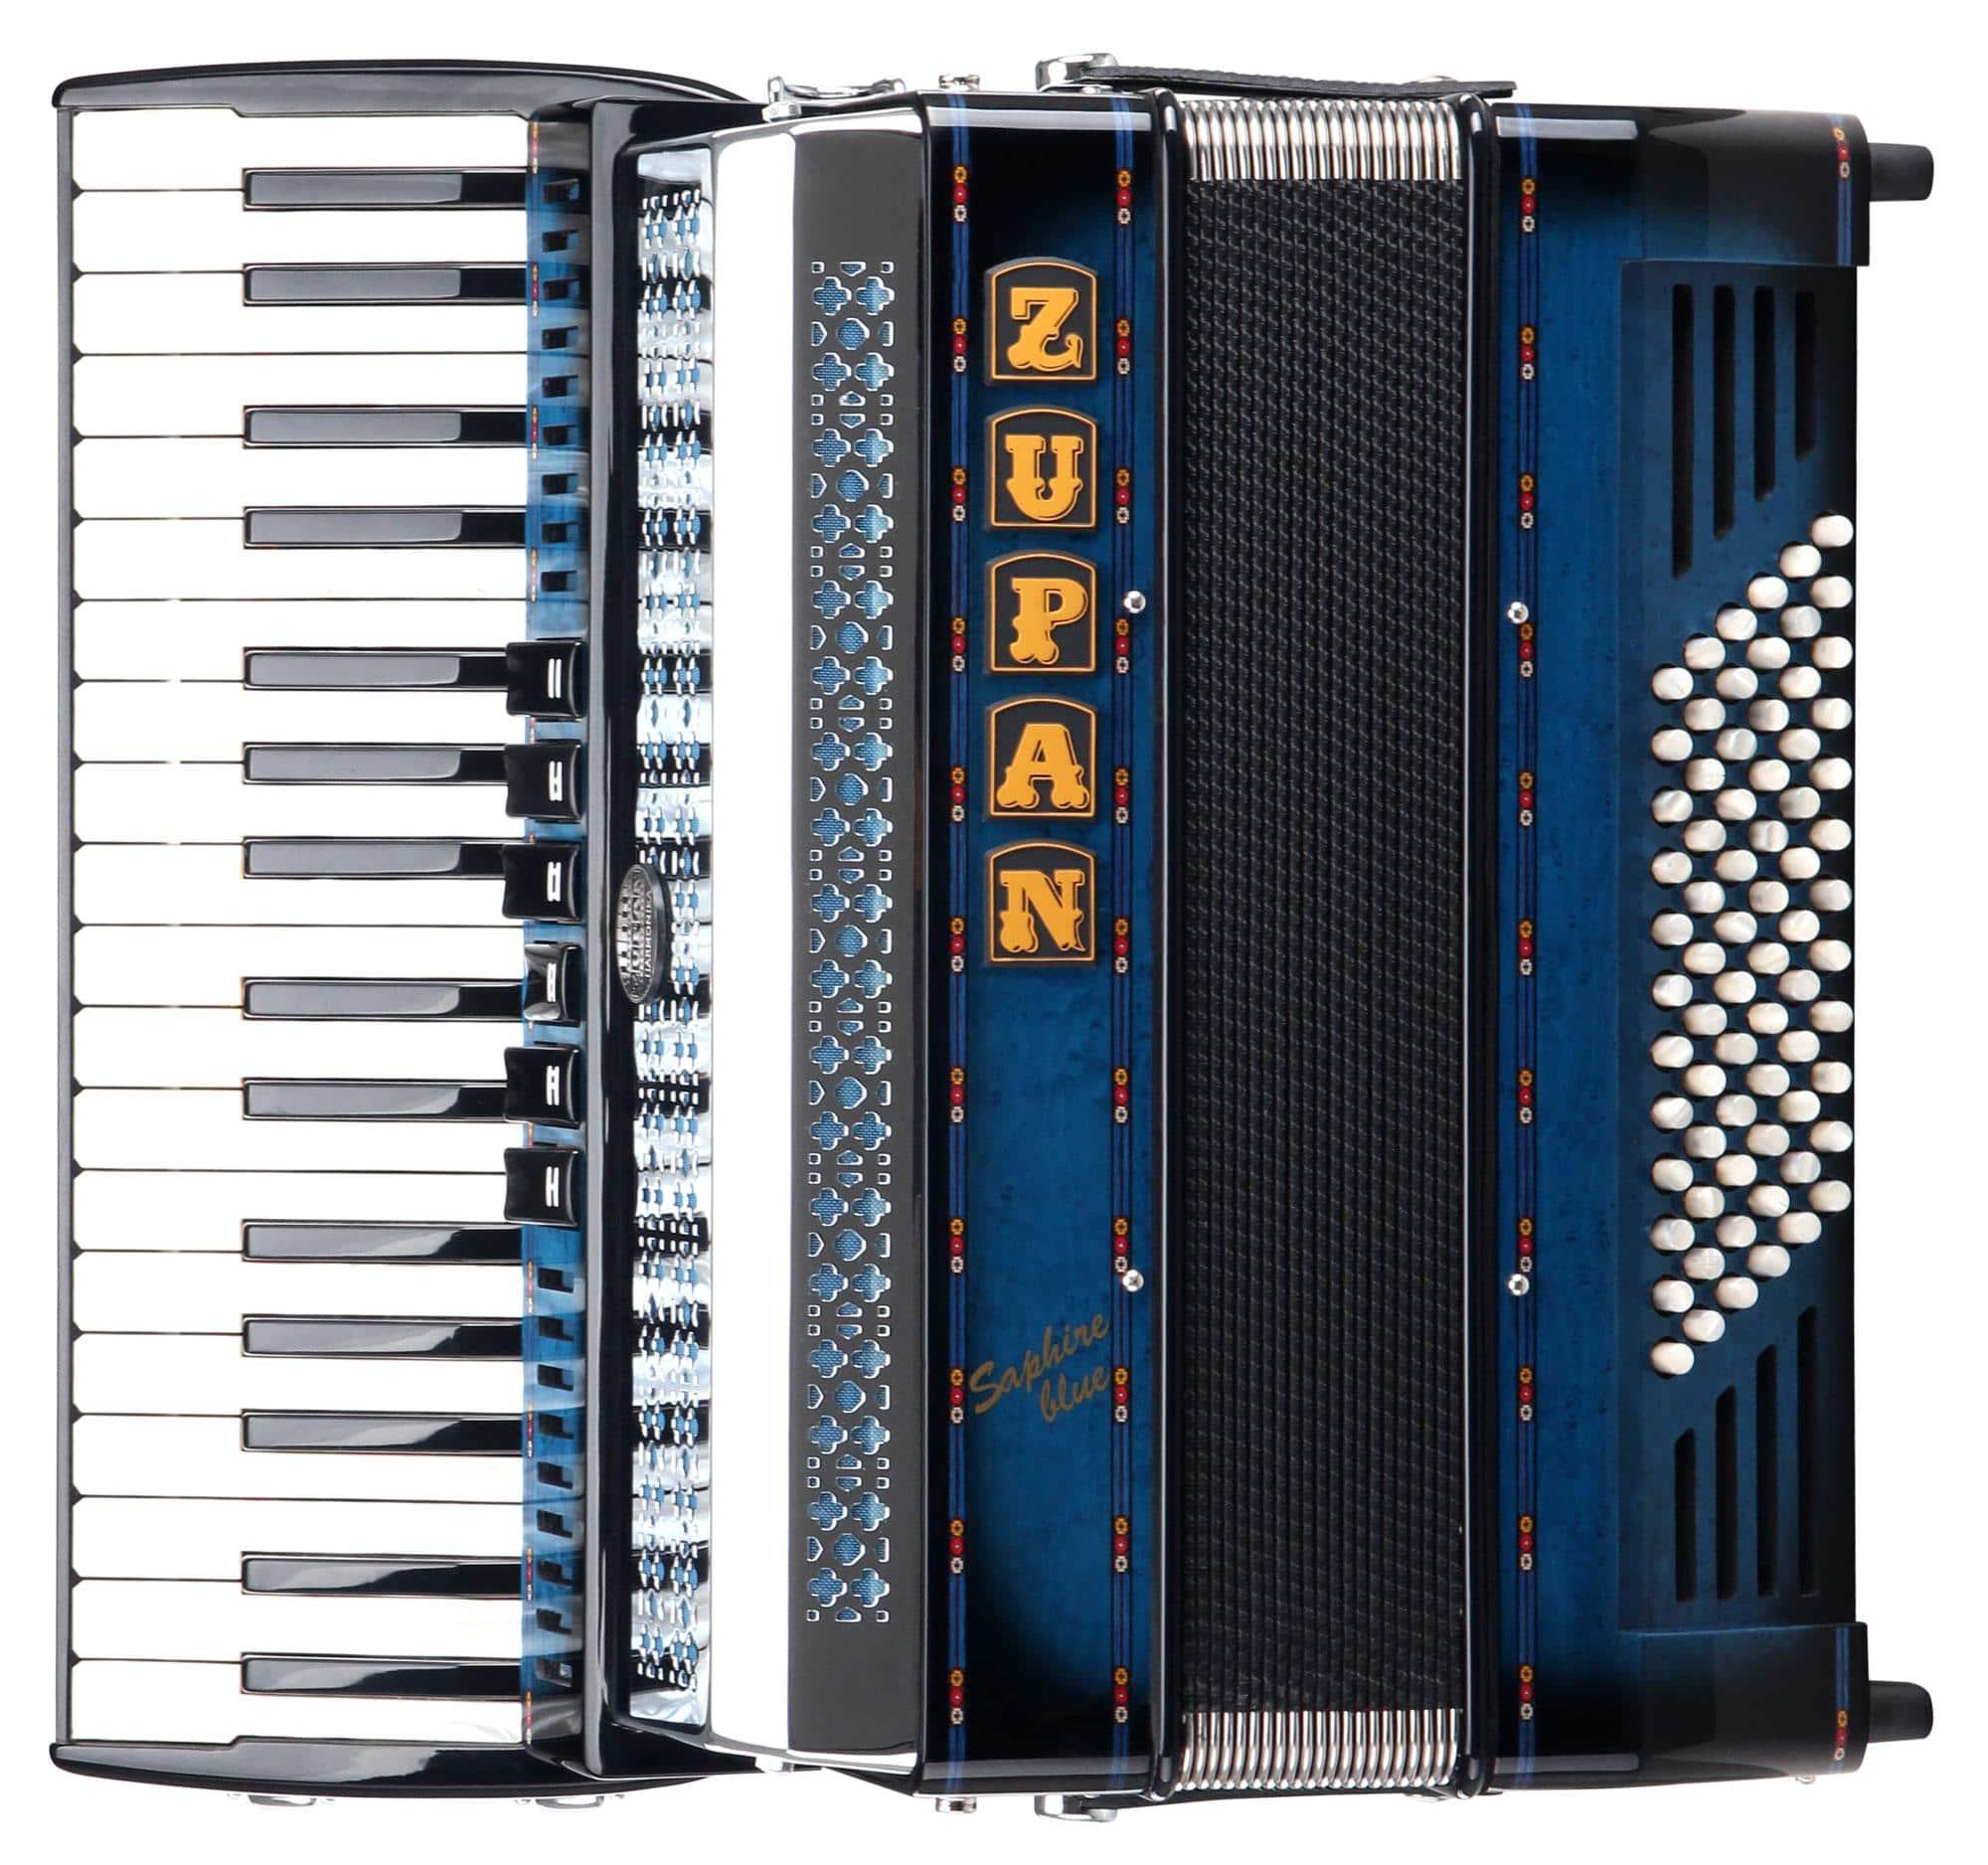 Akkordeons - Zupan Saphire III 72 MH Akkordeon Shadow Blue - Onlineshop Musikhaus Kirstein